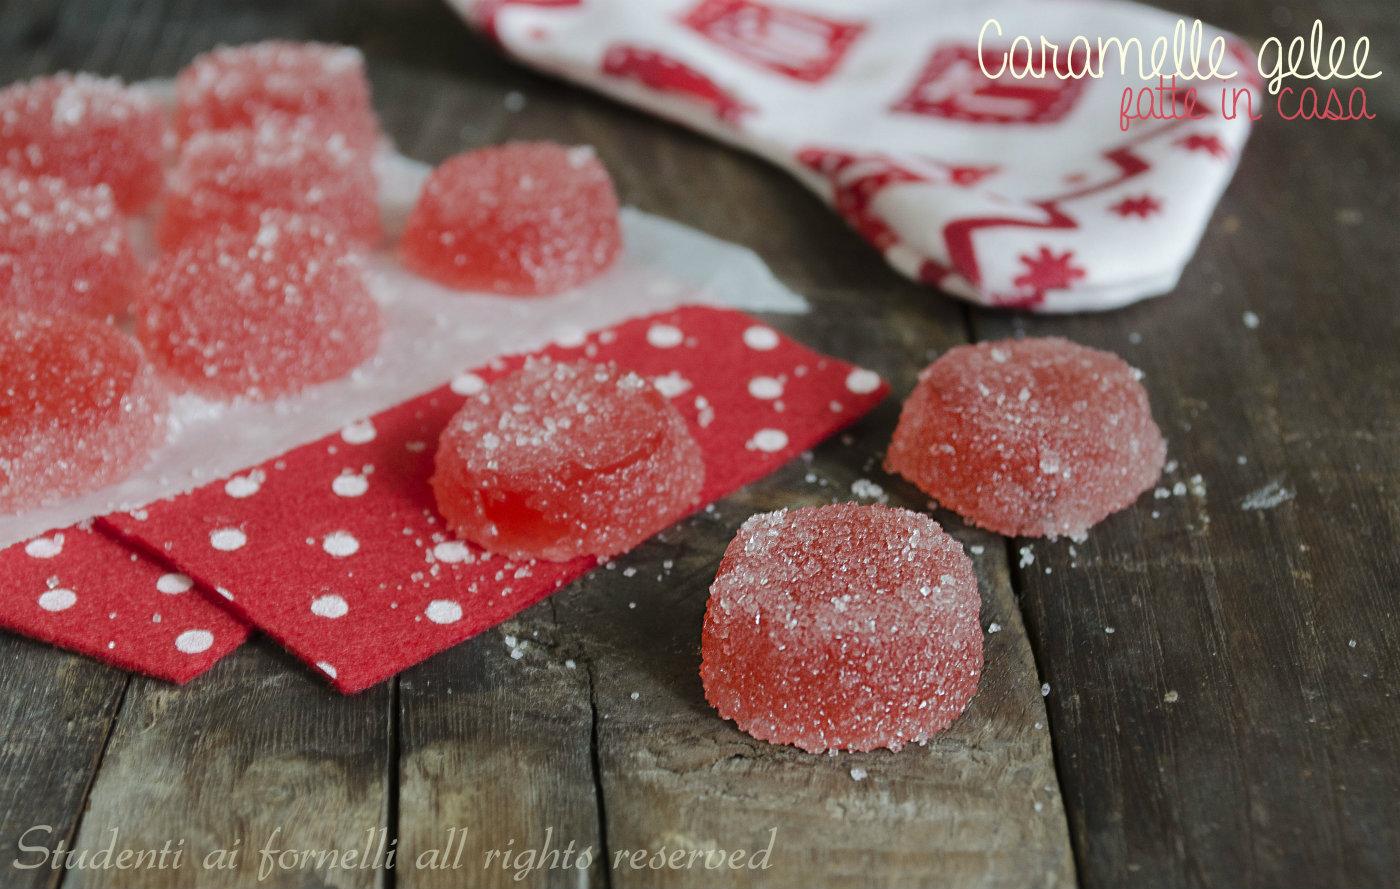 Caramelle gelee alla frutta fatte in casa ricetta for Casa di caramelle